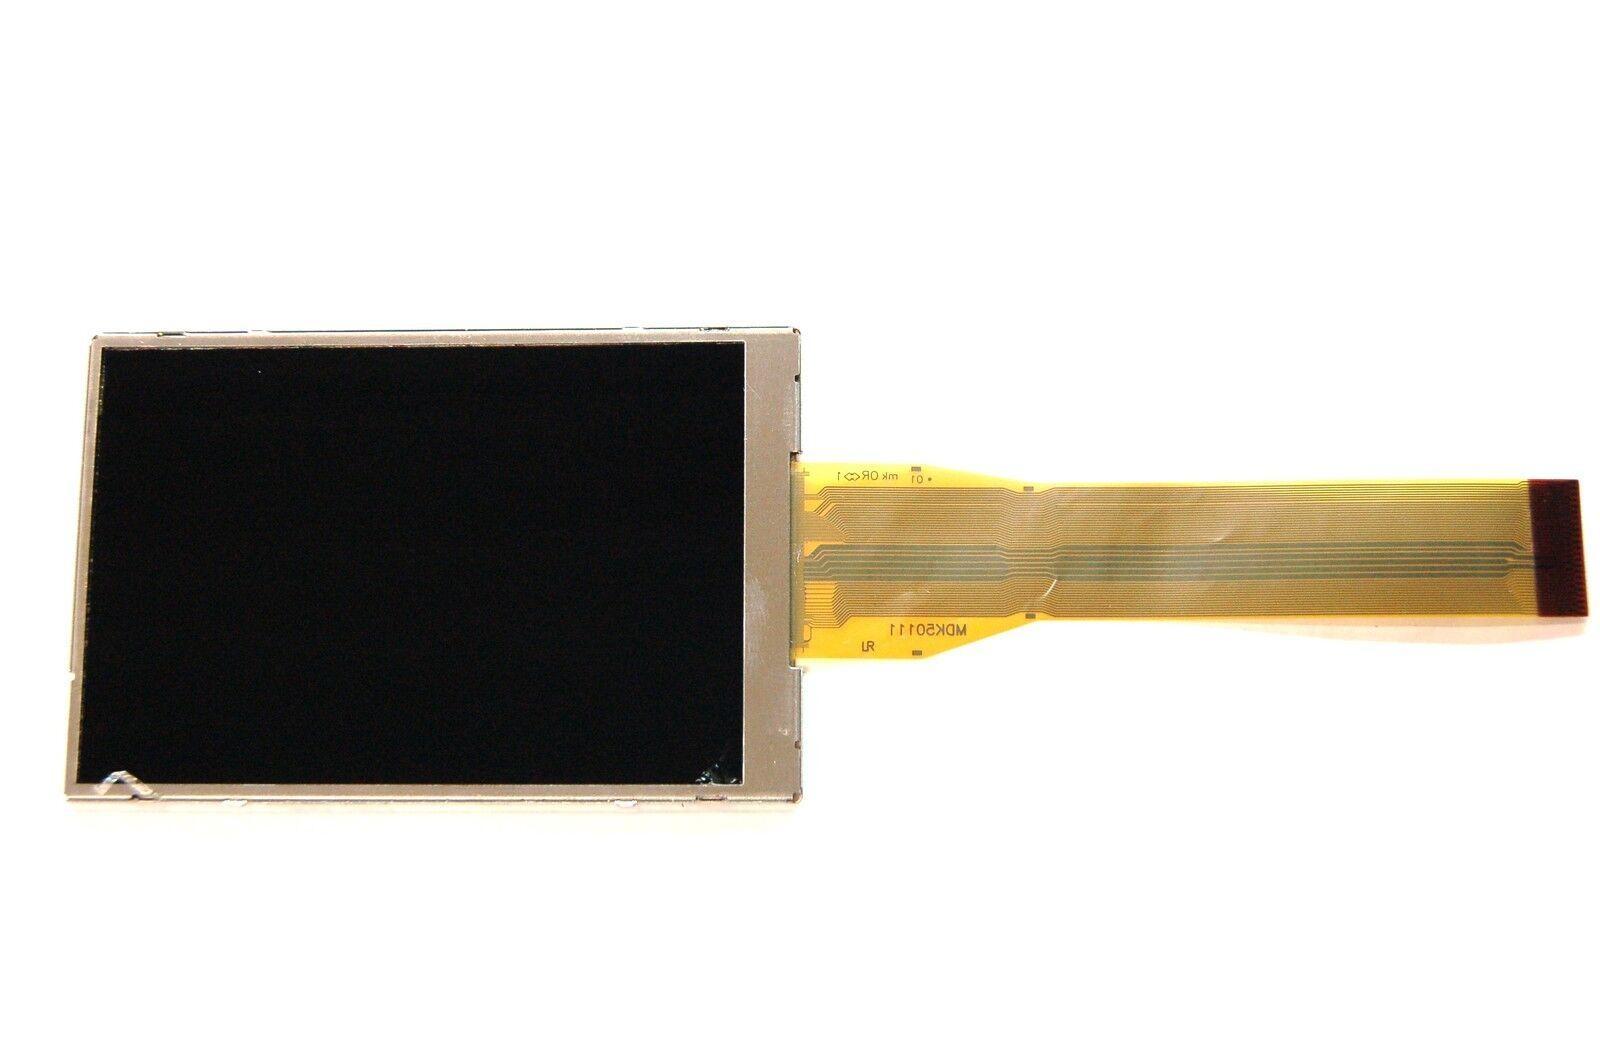 Panasonic Lumix Dmc-lx3 Dmc-g2 Lcd Display Screen